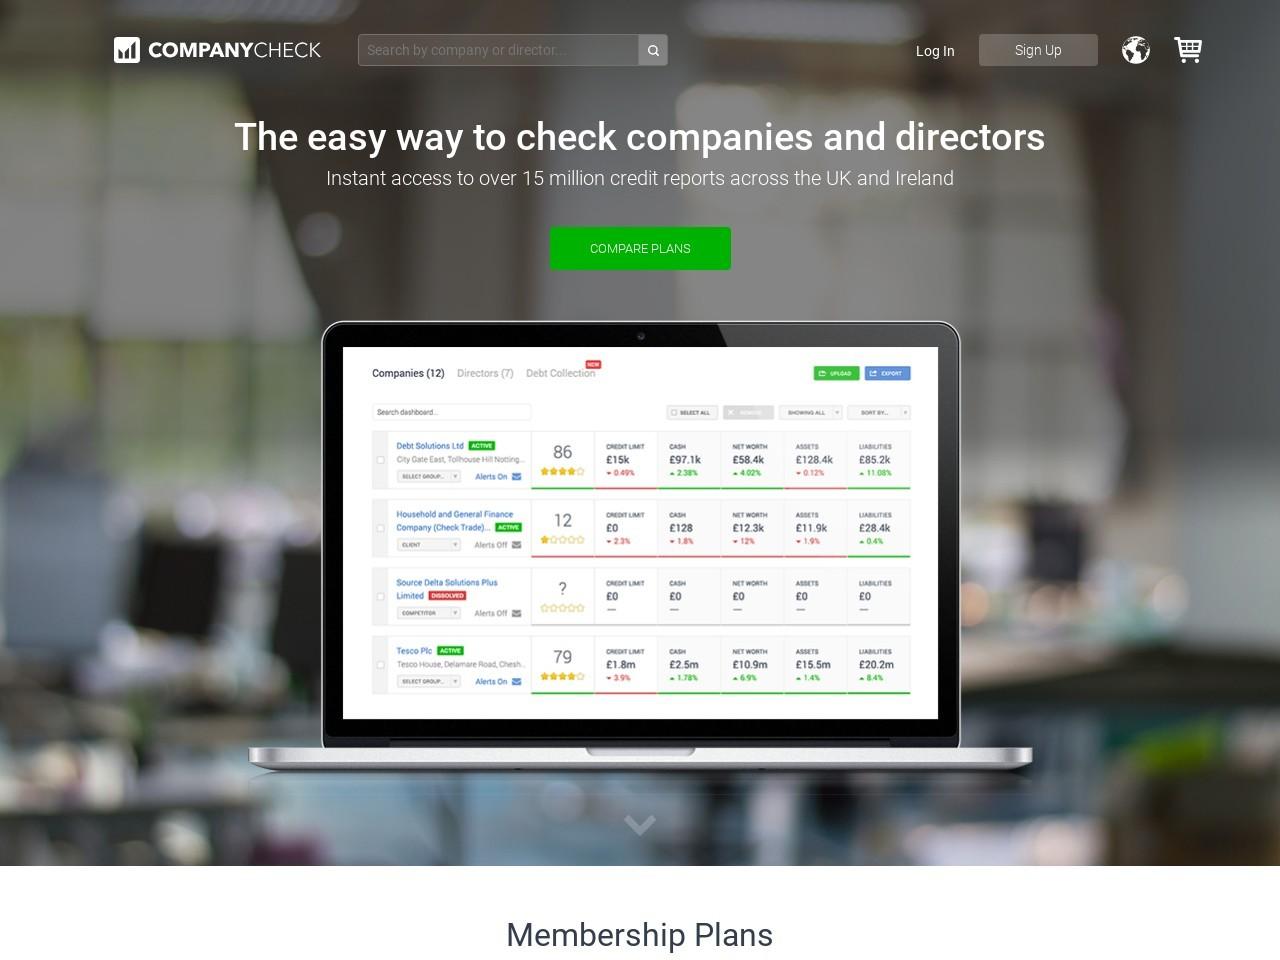 companycheck.co.uk